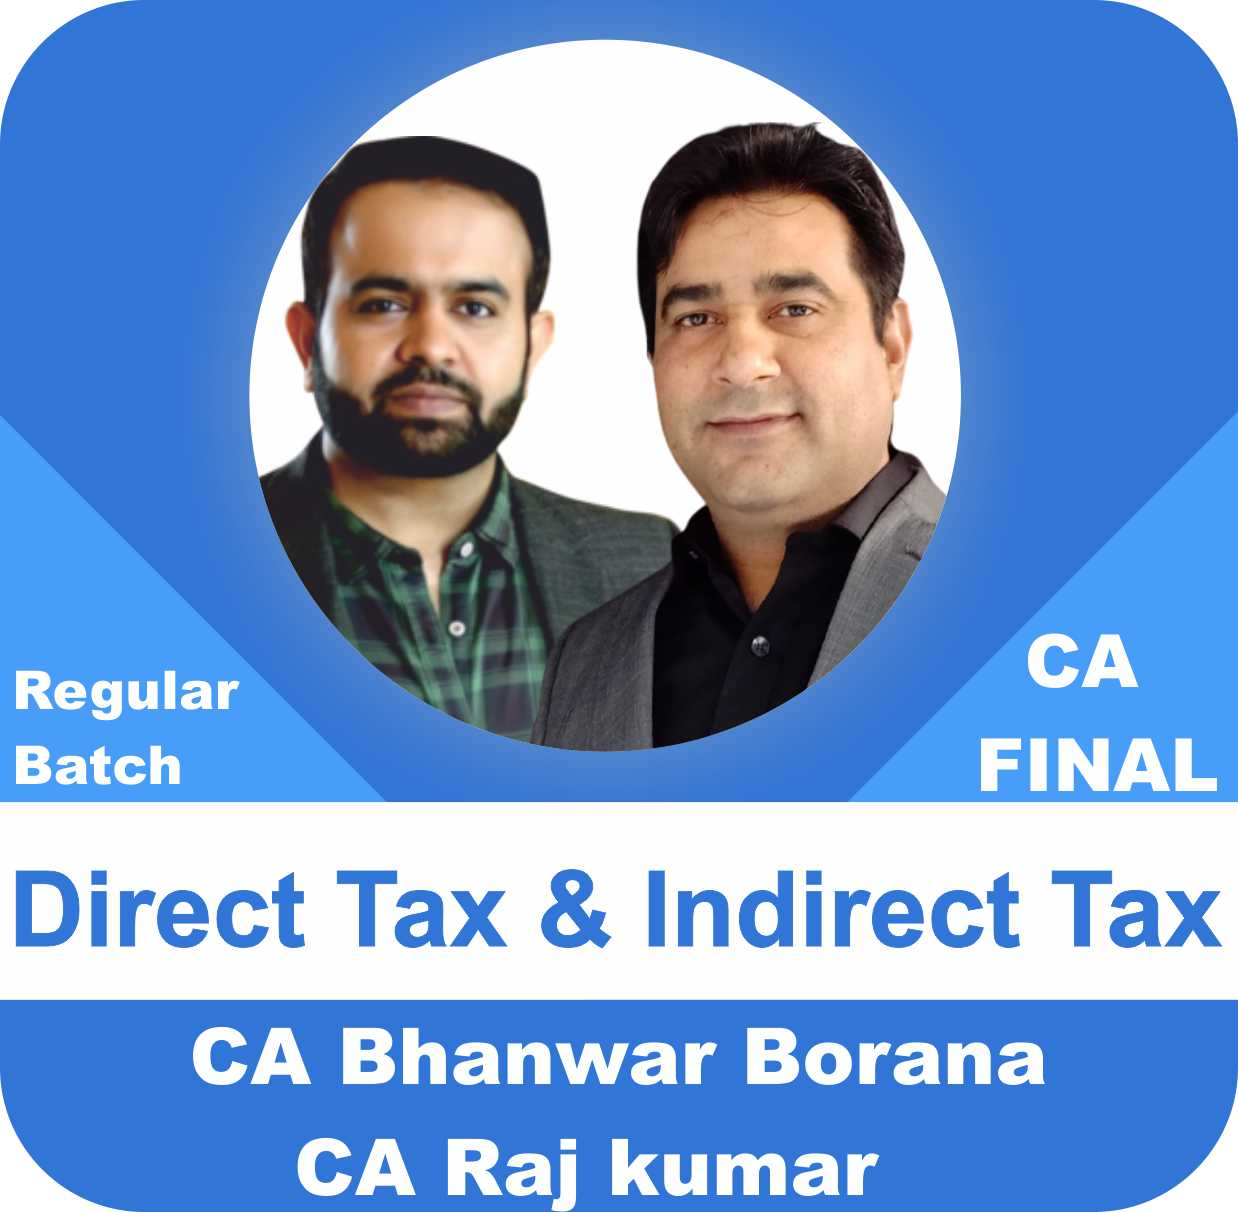 Direct Tax & Indirect Tax Latest Regular Batch Combo